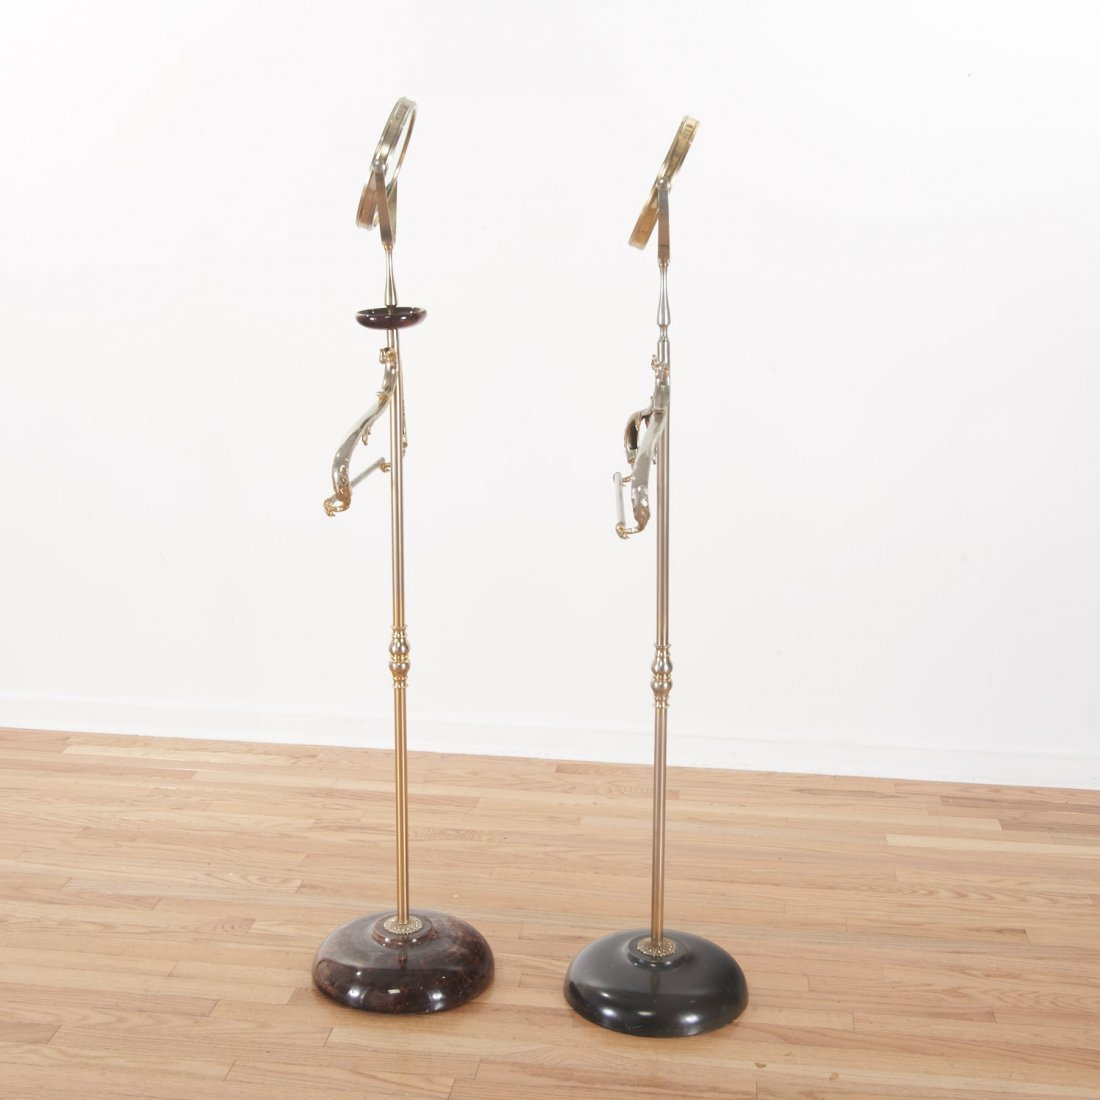 Aldo Tura lacquer, parchment valet/vanity stands - 6